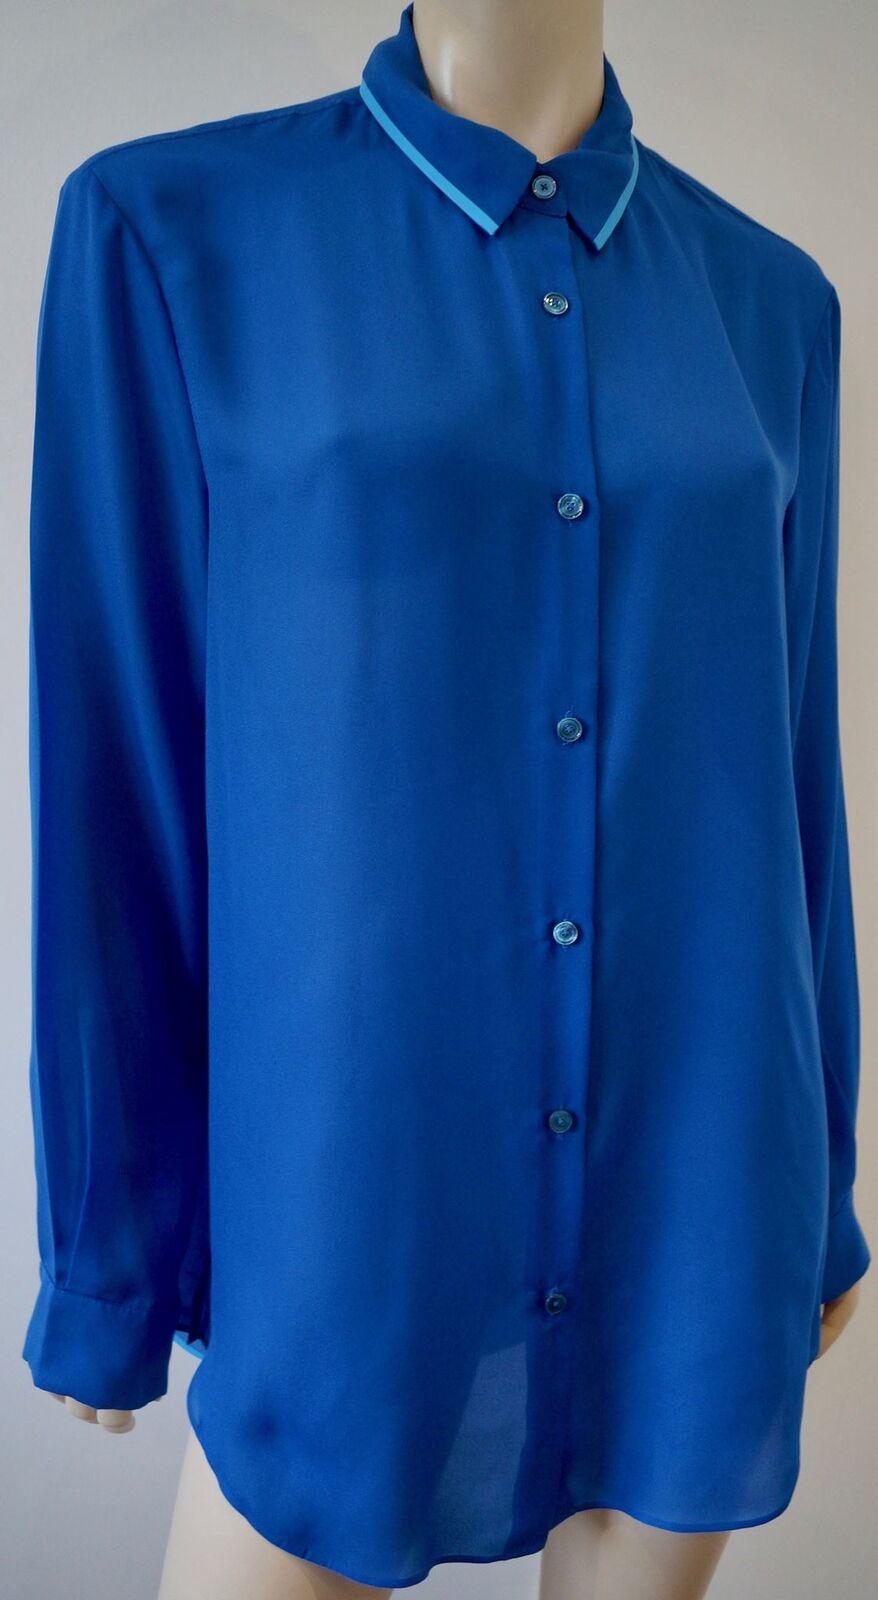 ACNE STUDIOS Woherren Blau Sheer OverGrößed PATTI TAPE Blouse Shirt Top FR38 UK10